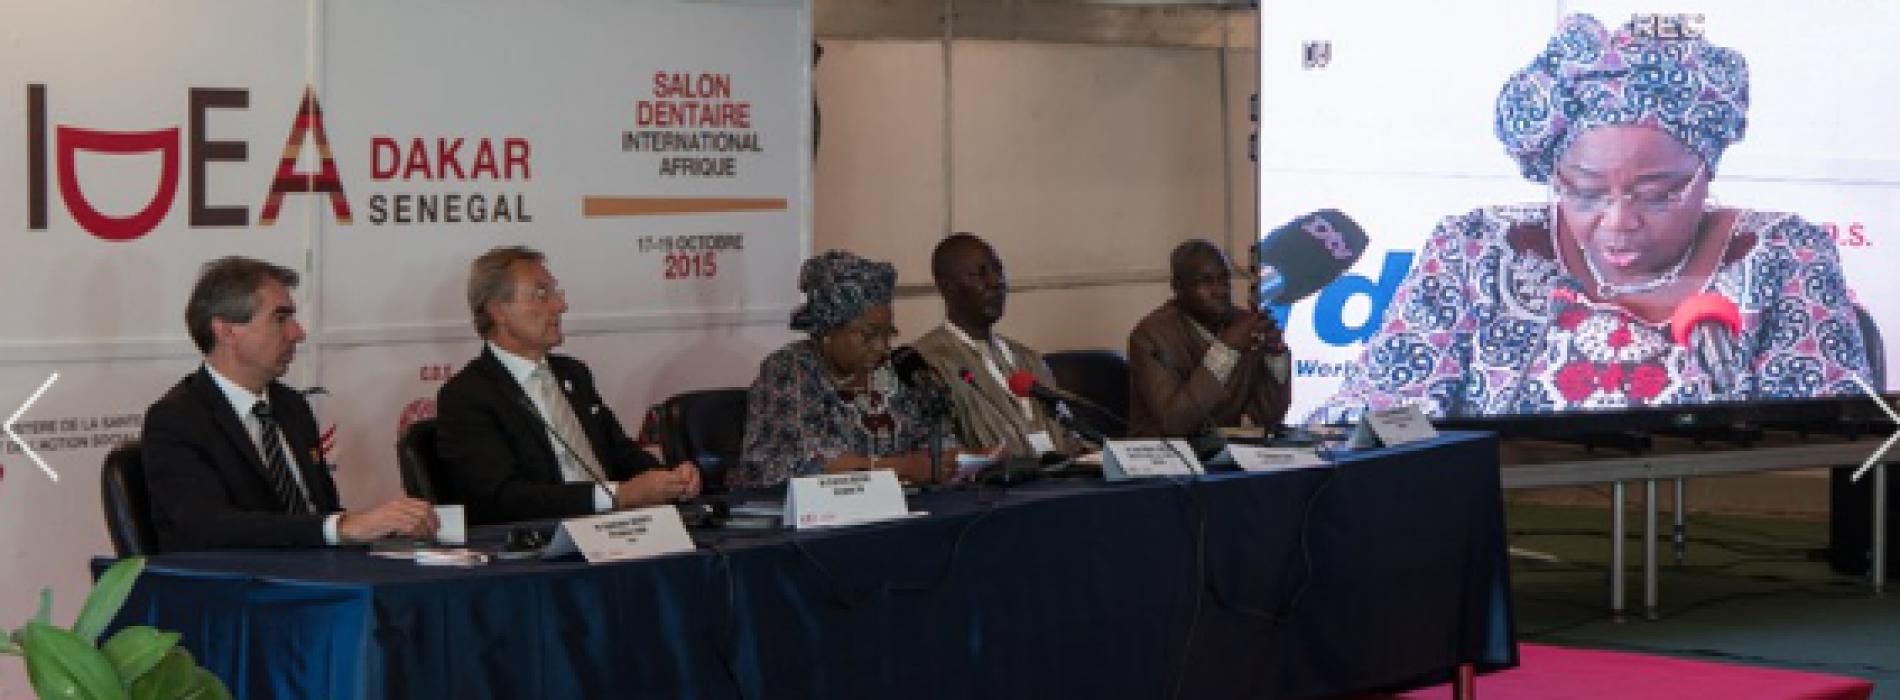 Il dentale in Africa: prospettive e strategie